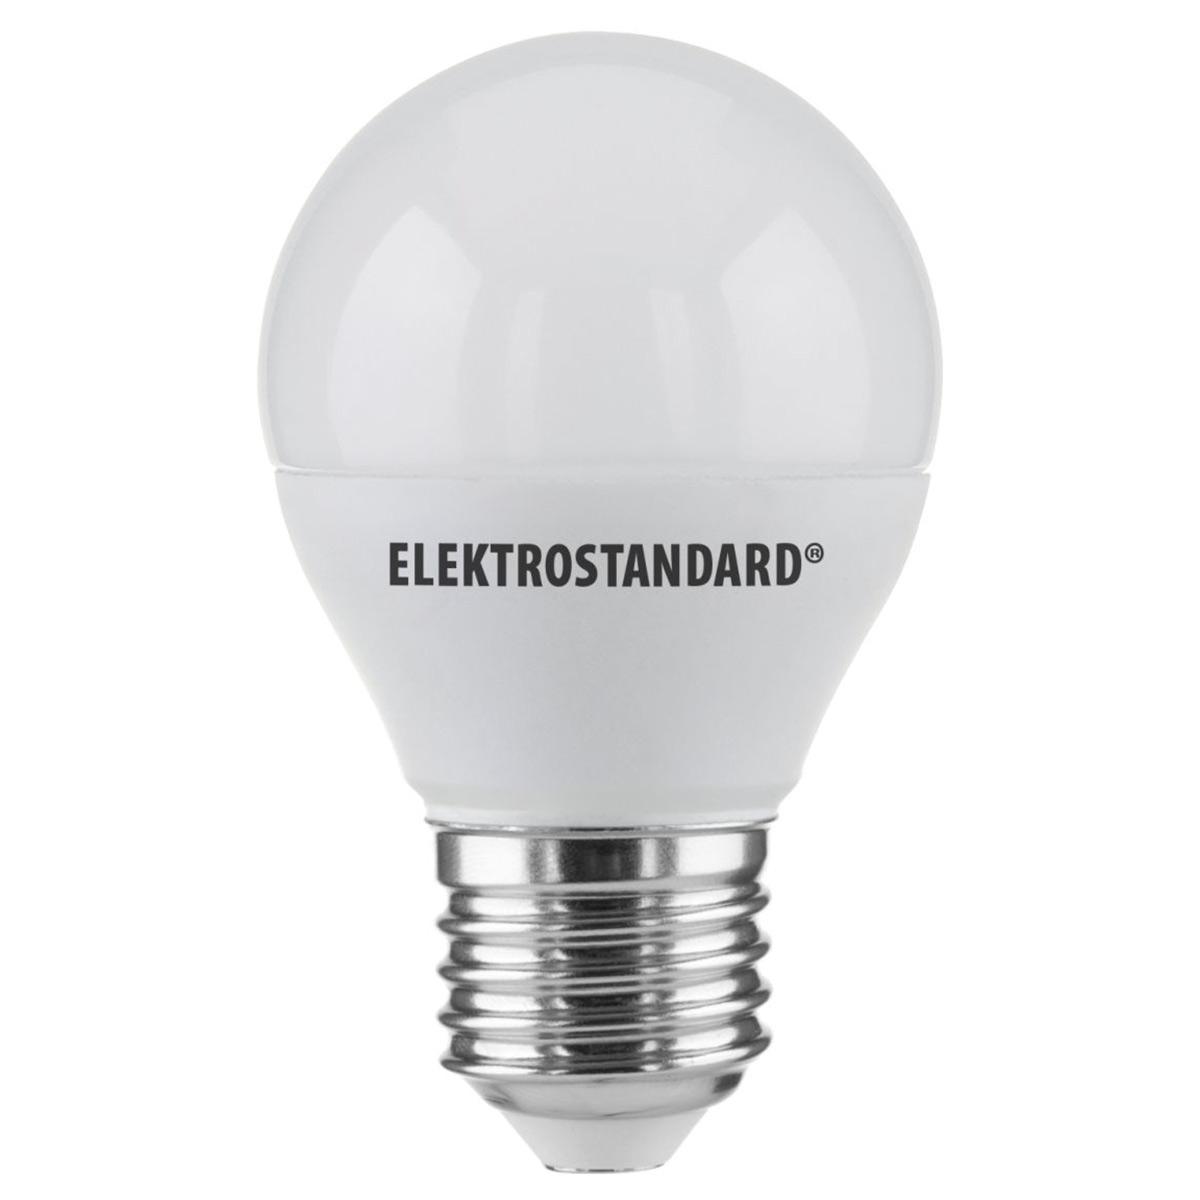 Лампа светодиодная E27 7W 3300K матовая 4690389085383 elektrostandard лампа светодиодная e14 7w 3300k шар матовый mini 4690389061622